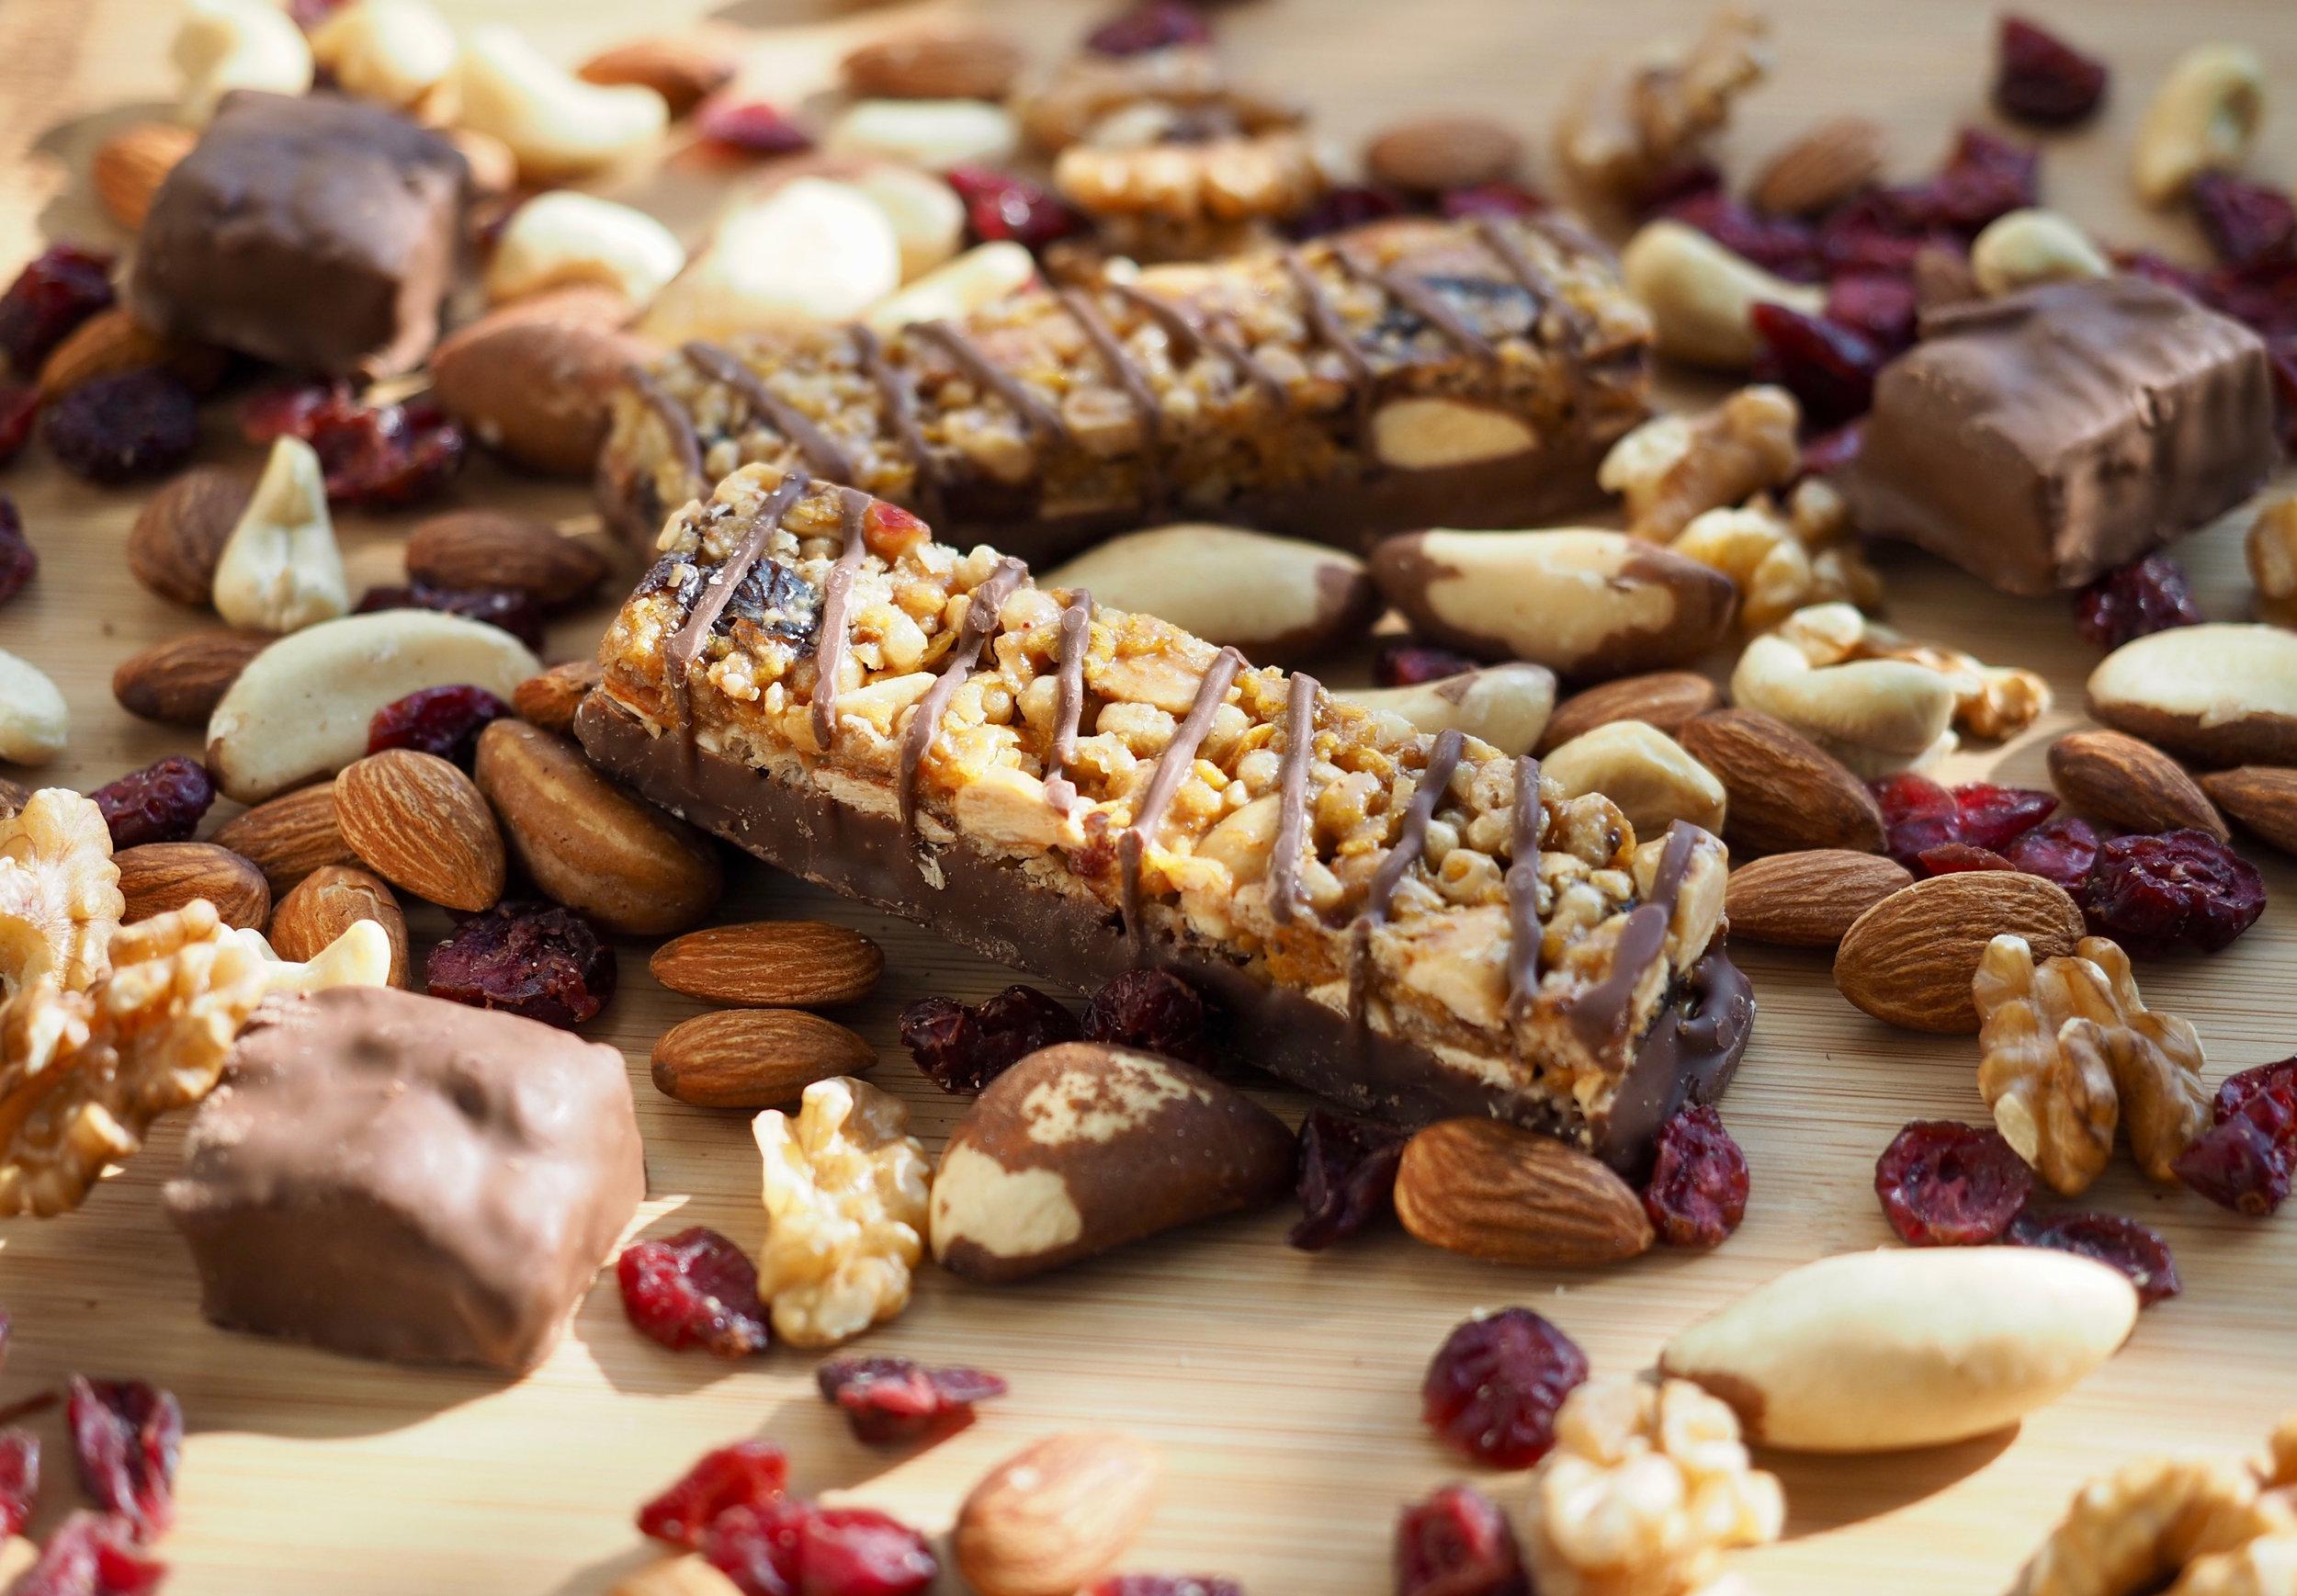 shutterstock_1256741062(Cherry Almond Fudge).jpg